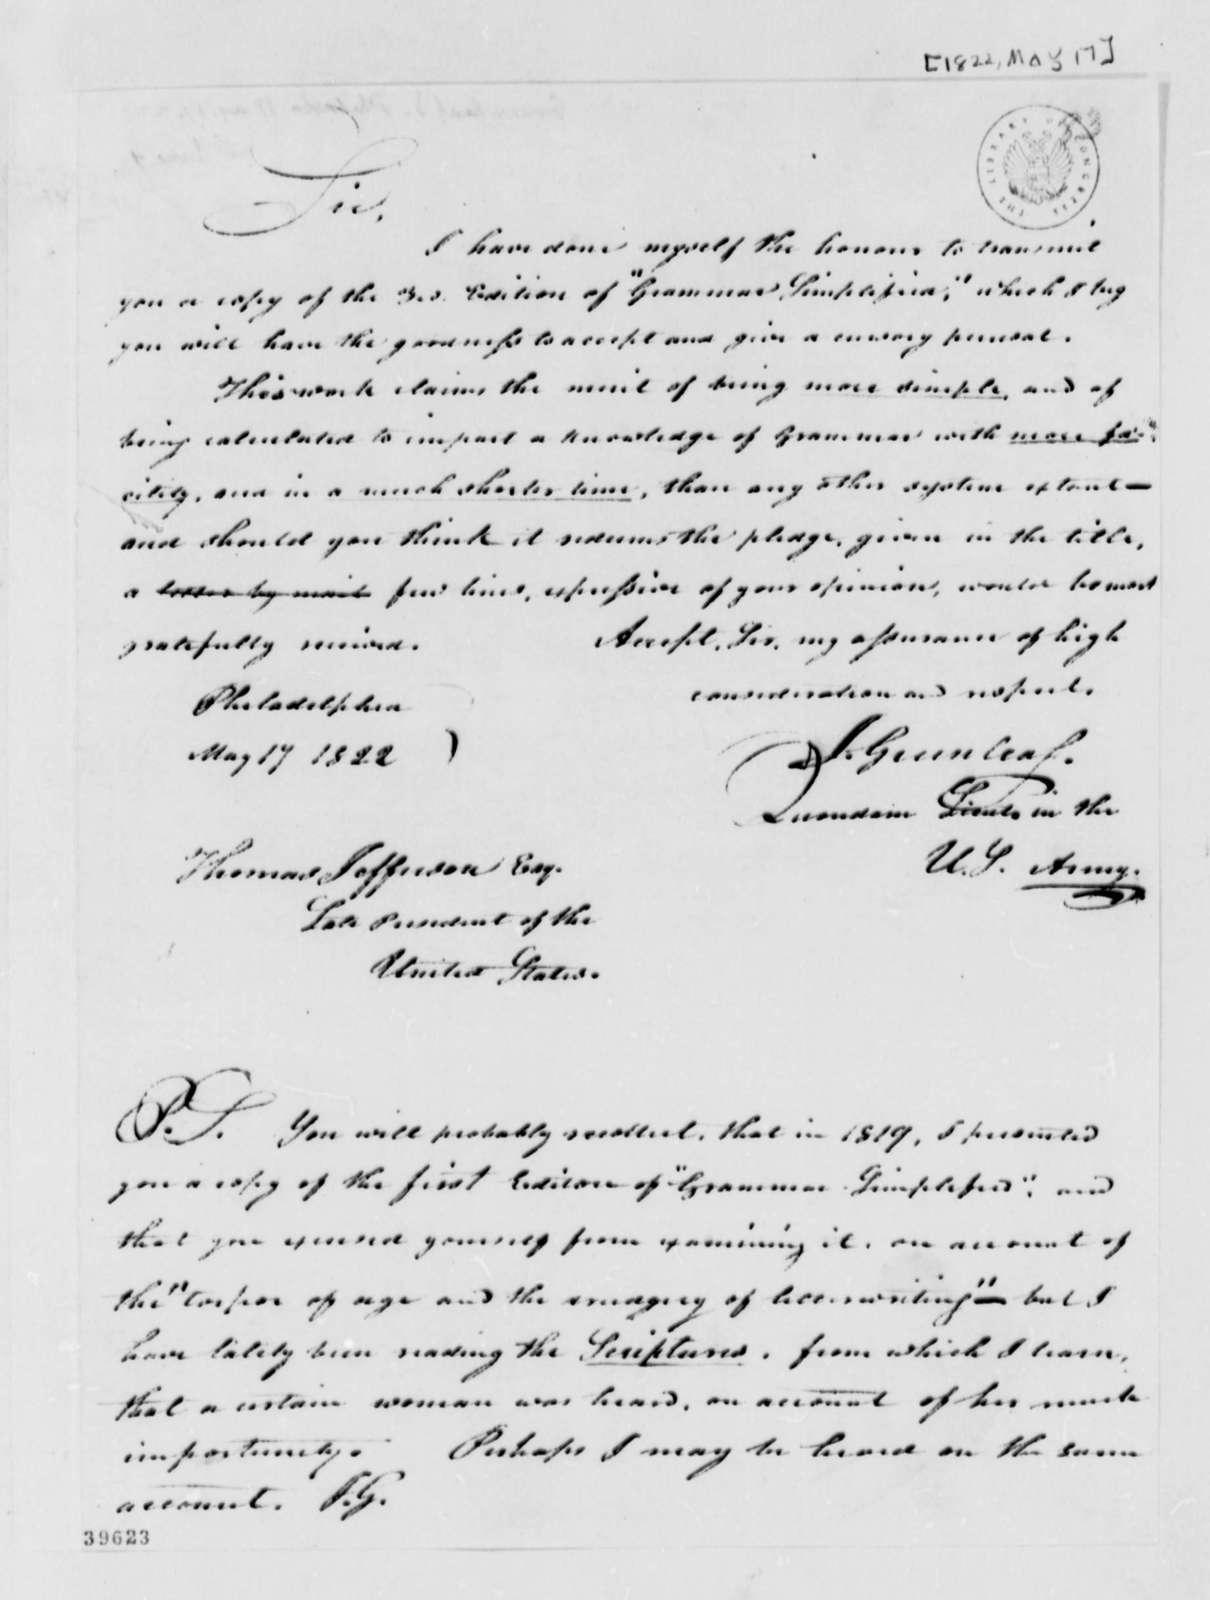 Jeremiah Greenleaf to Thomas Jefferson, May 17, 1822